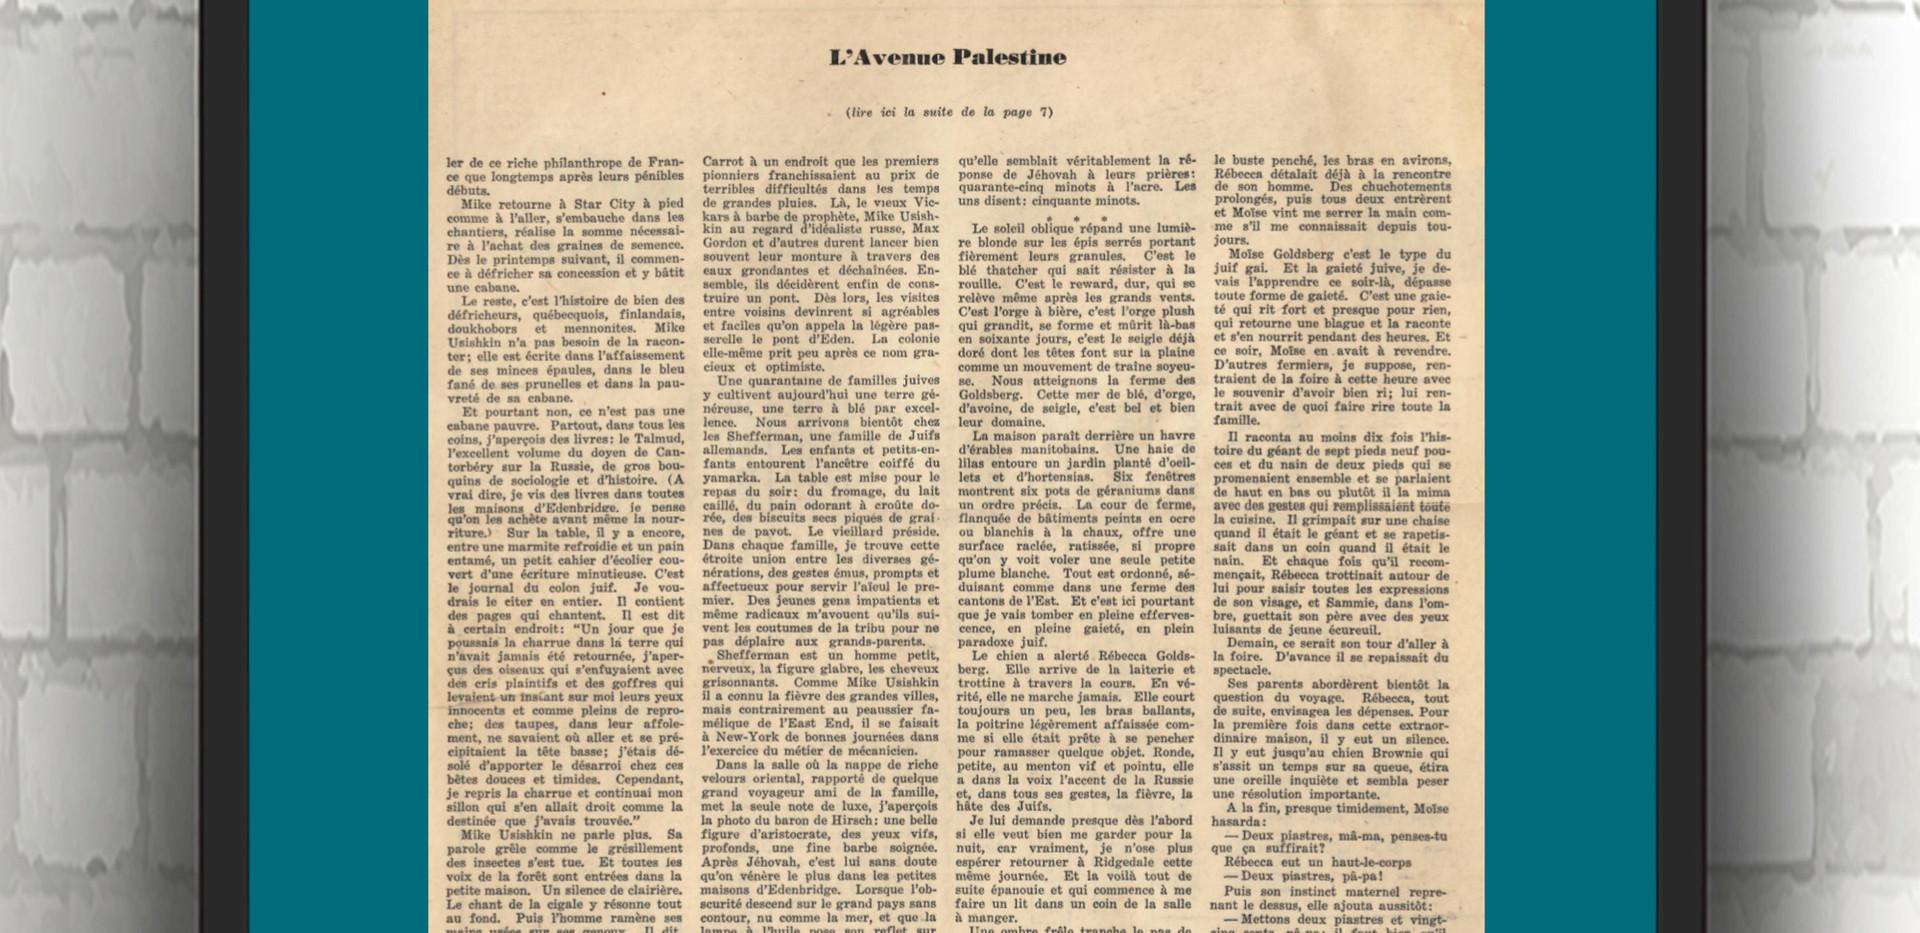 L'avenue_Palestine_FÉVRIER_1943.jpg